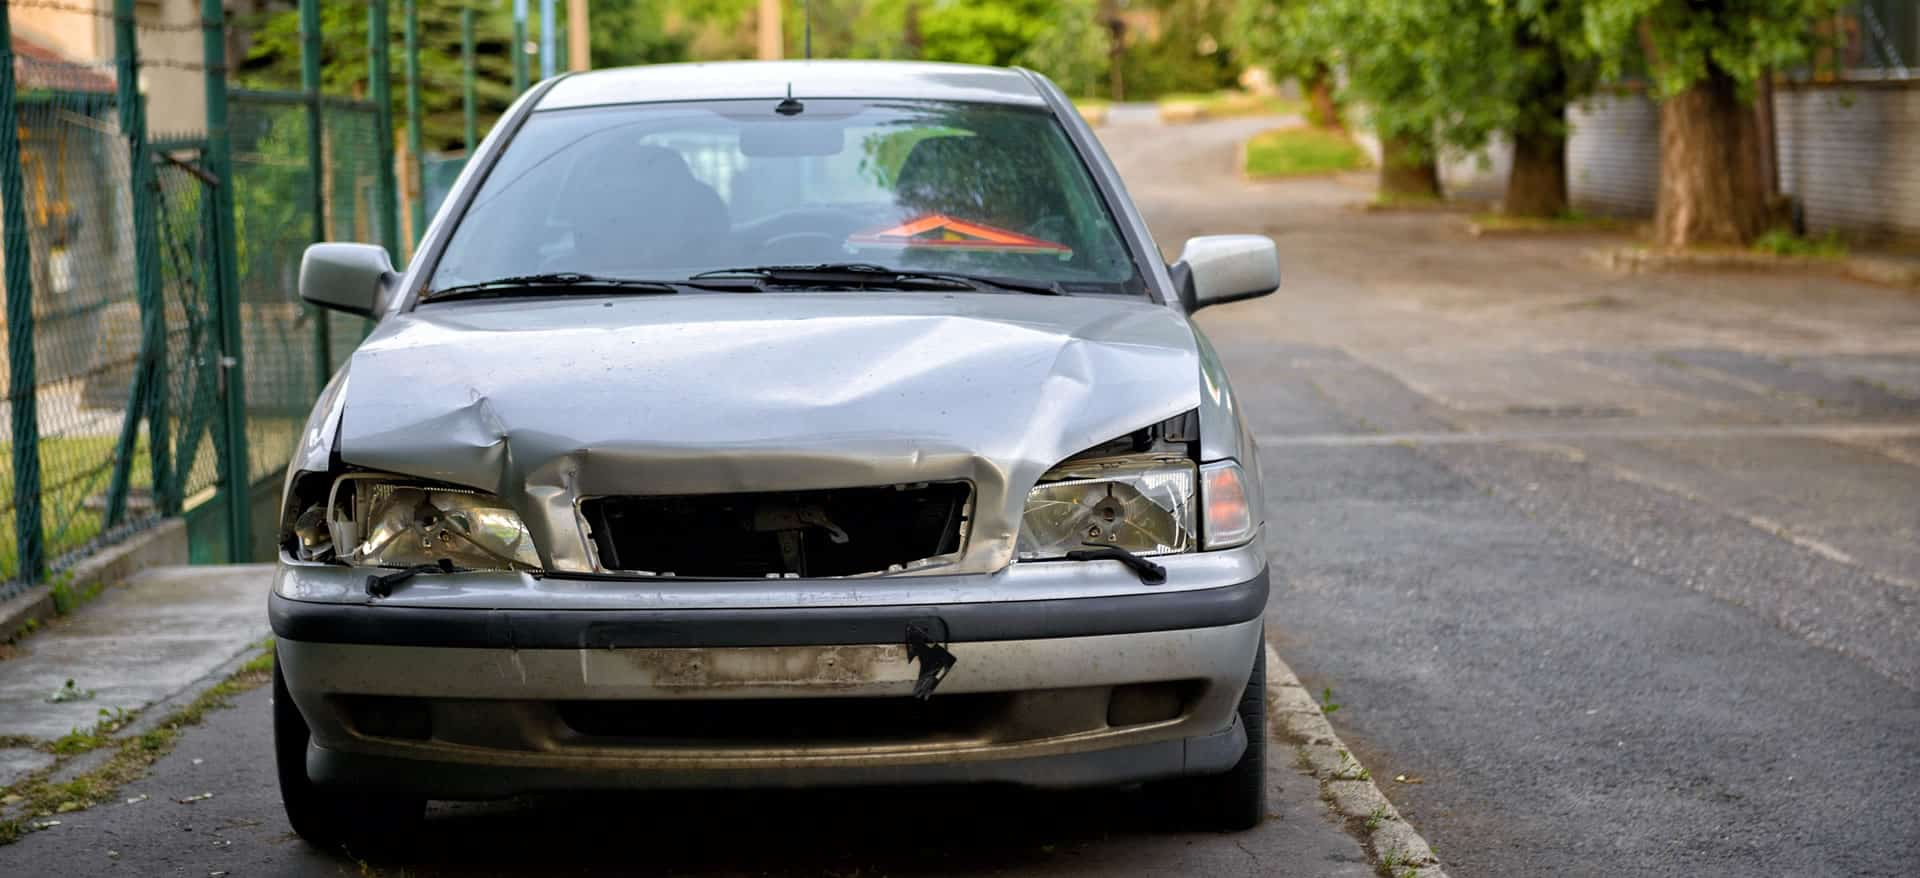 junk cars Poncey-Highland